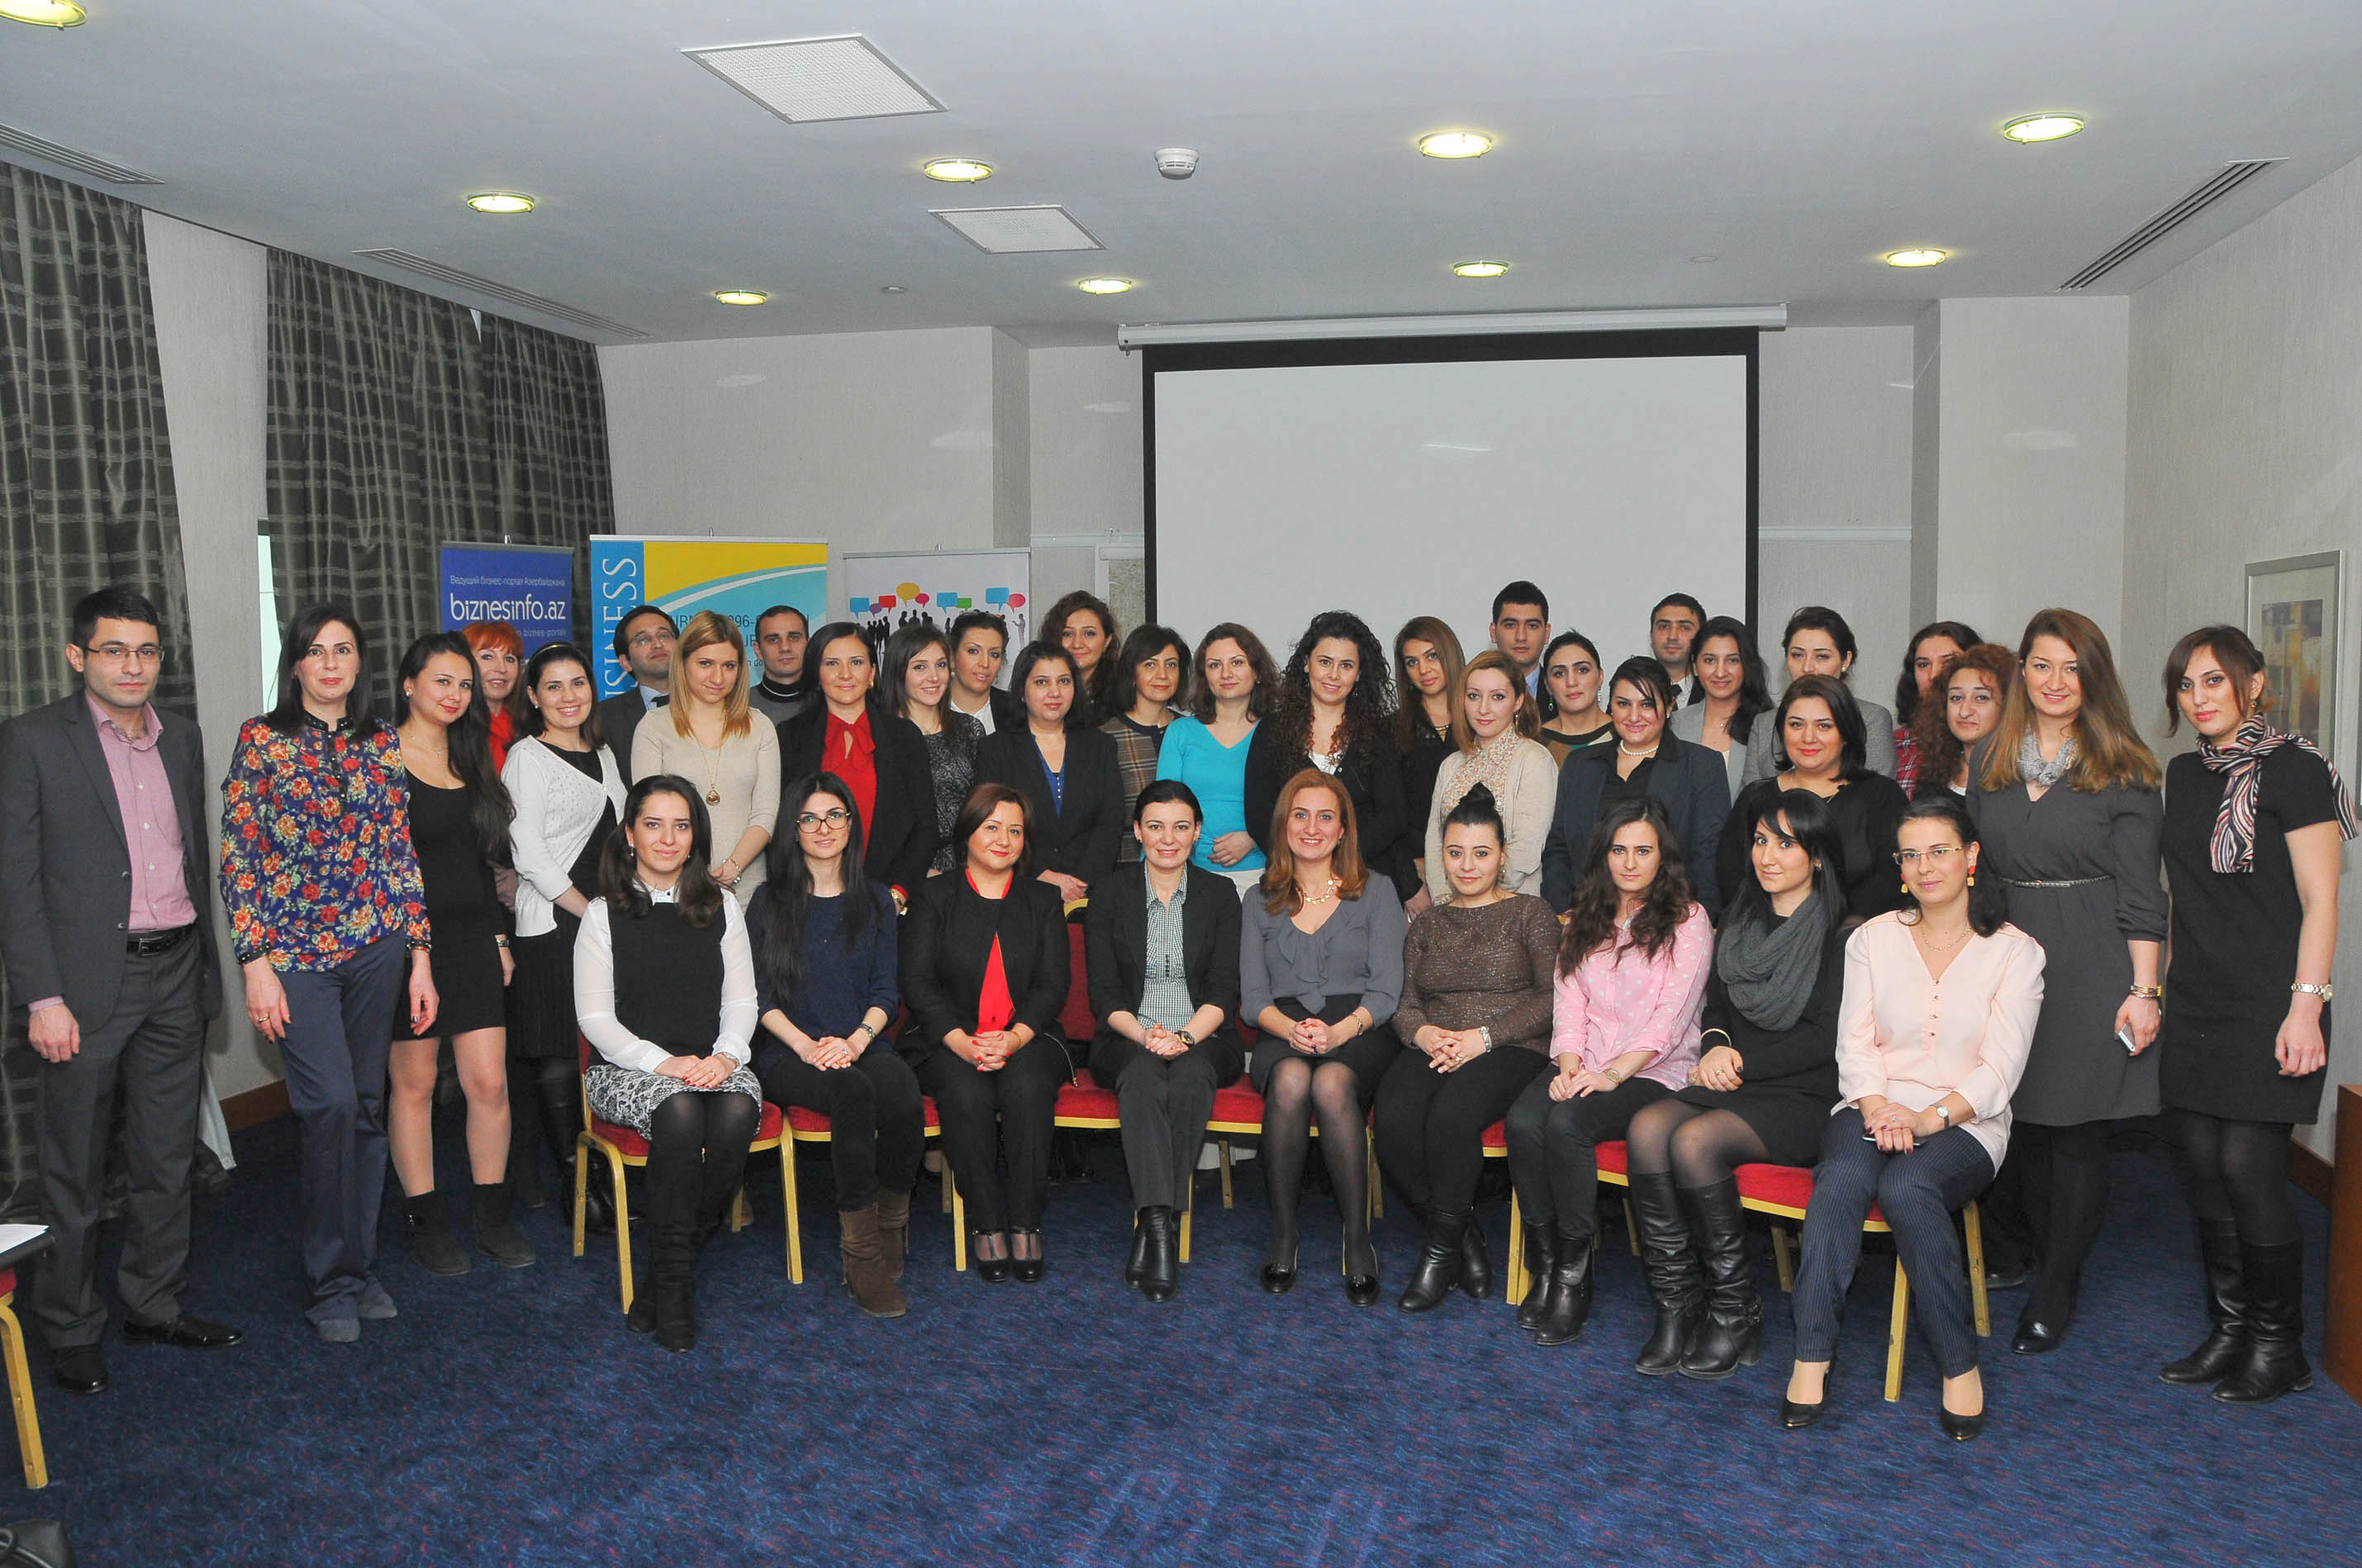 HR Networking Breakfast собрал HR-специалистов ведущих компаний страны